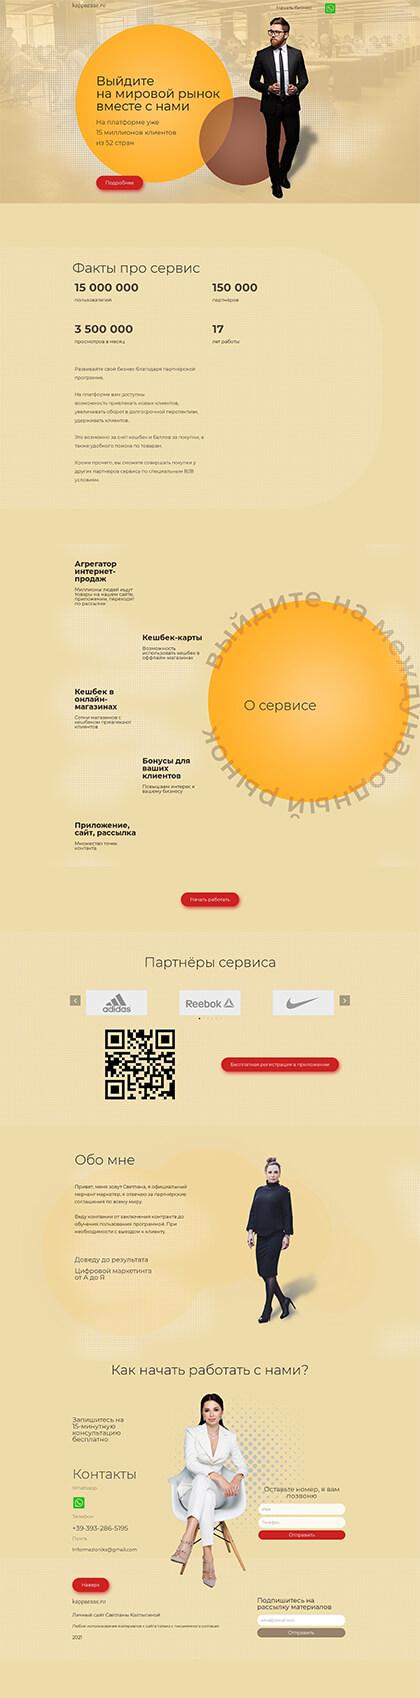 omnis_x_screen_kappaesse.ru